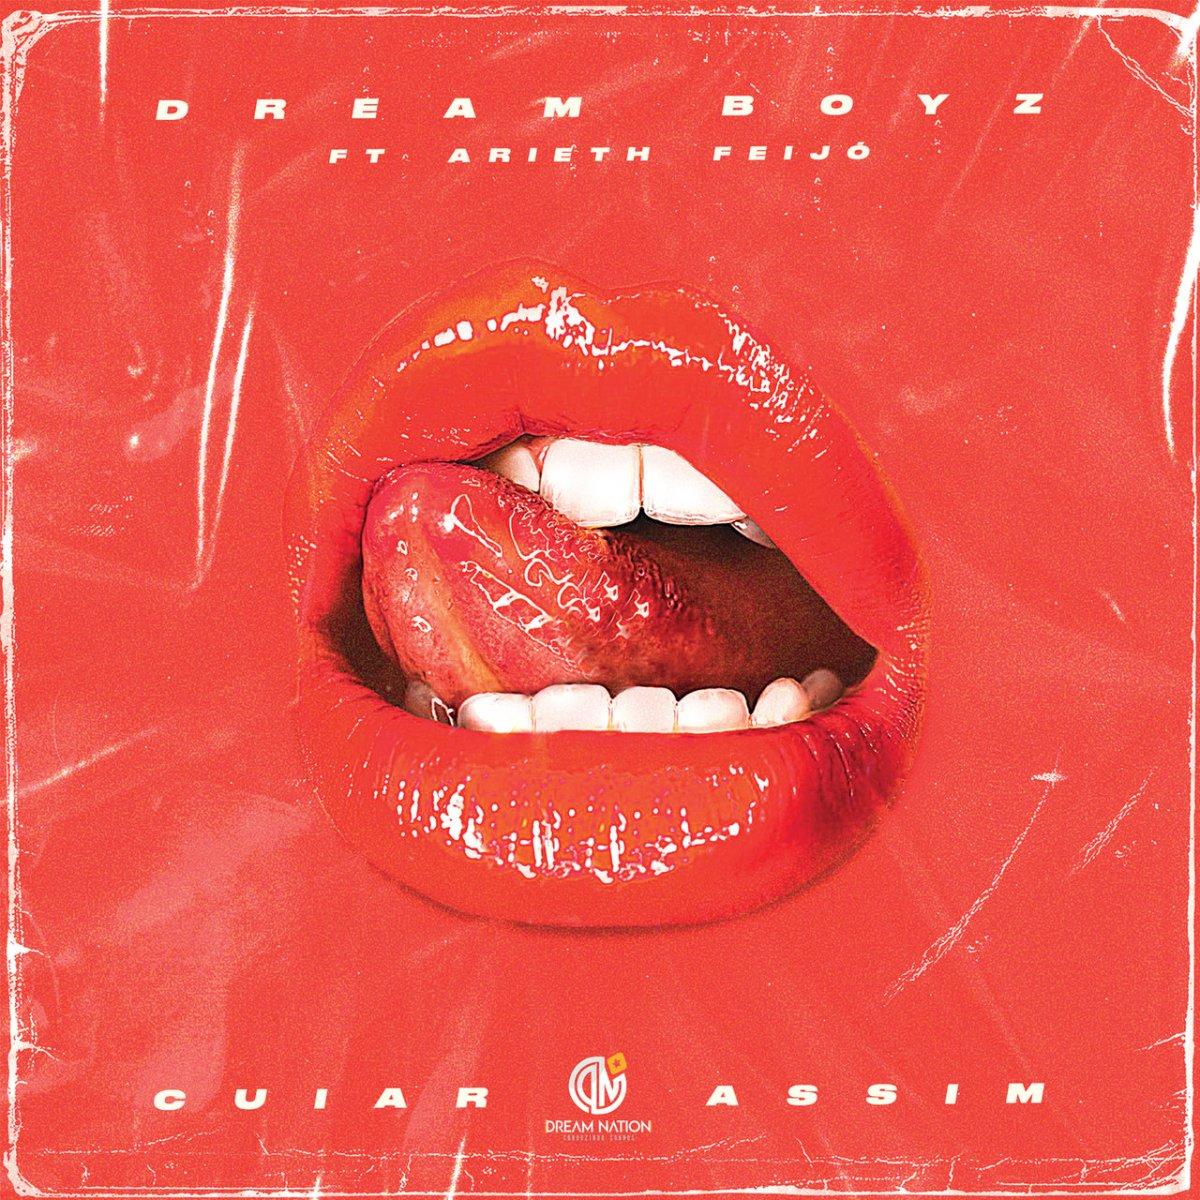 Dream Boyz - Cuiar Assim (ft. Arieth Feijó) (Cover)